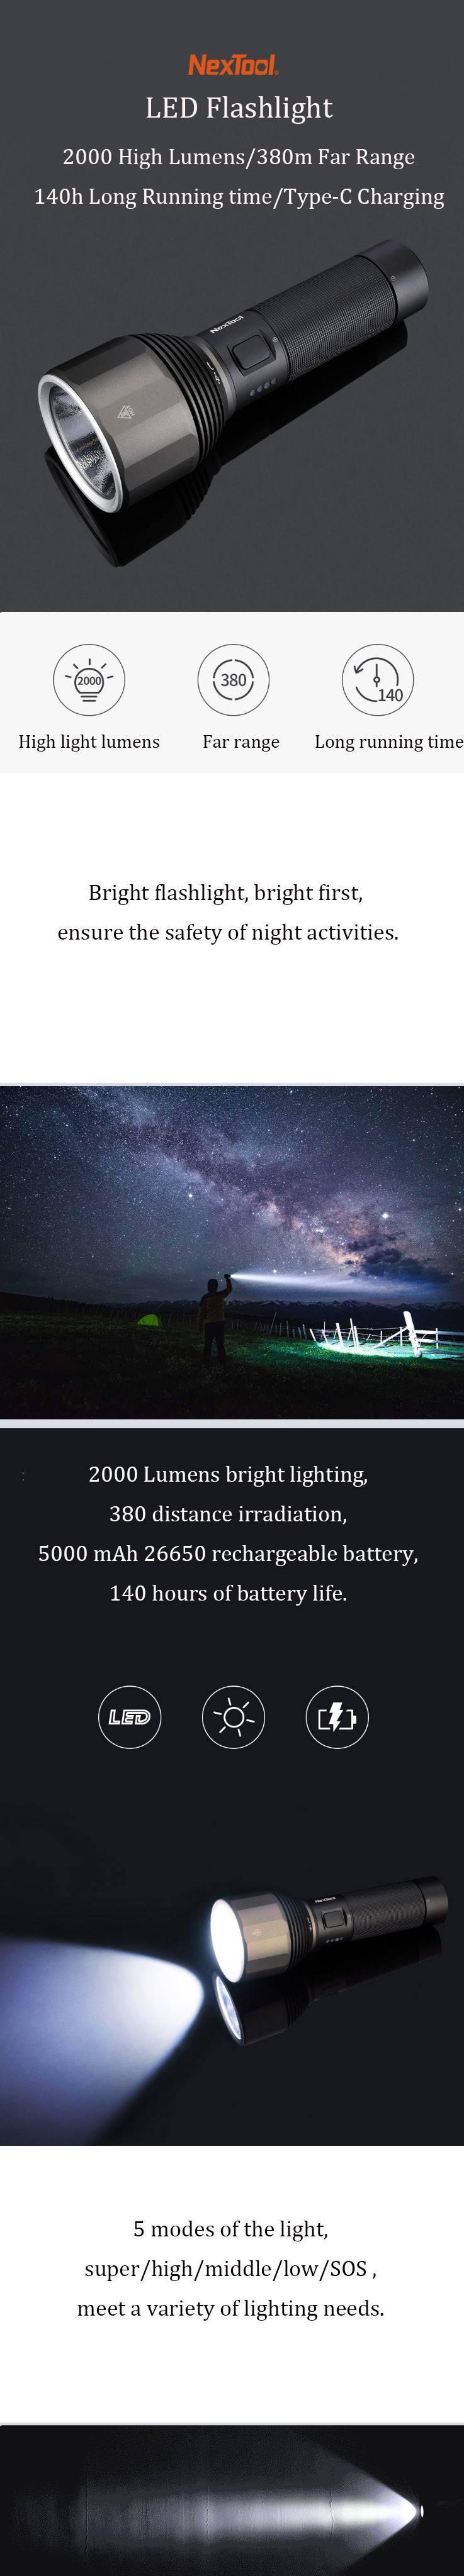 Xiaomi Nextool Flashlight IPX7-3